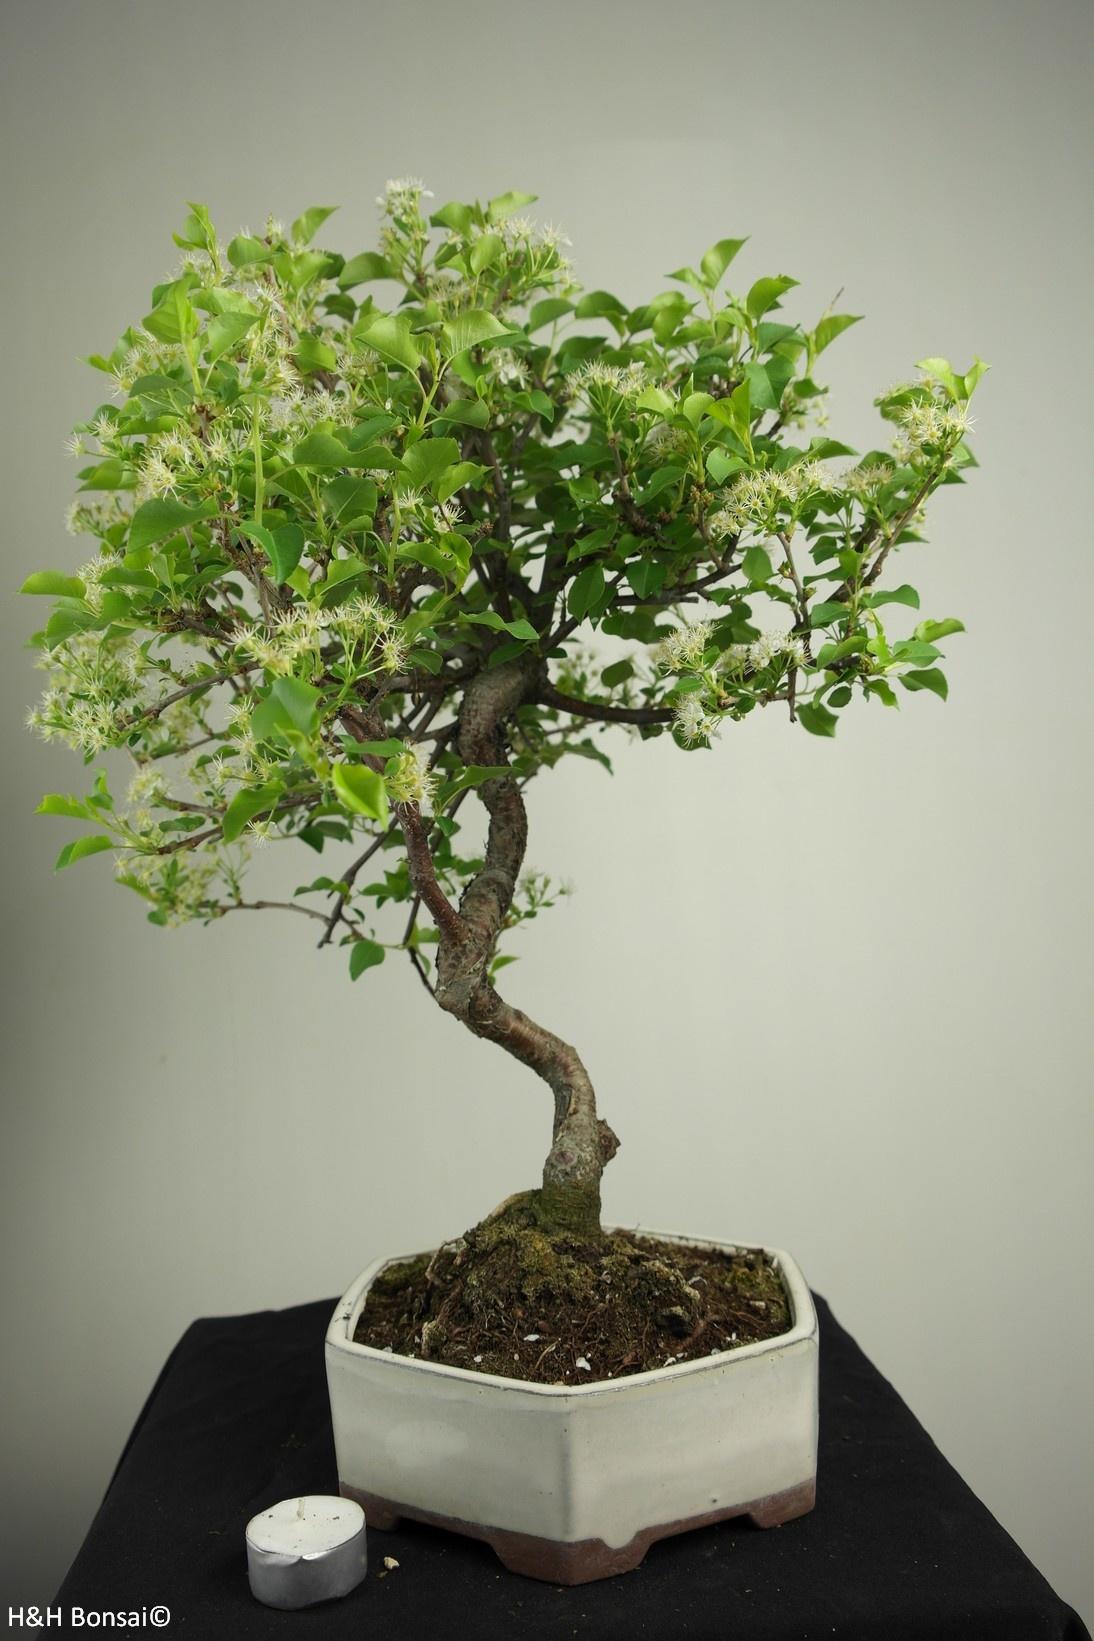 Bonsai Prunus mahaleb, Mahaleb cherry, no. 7669